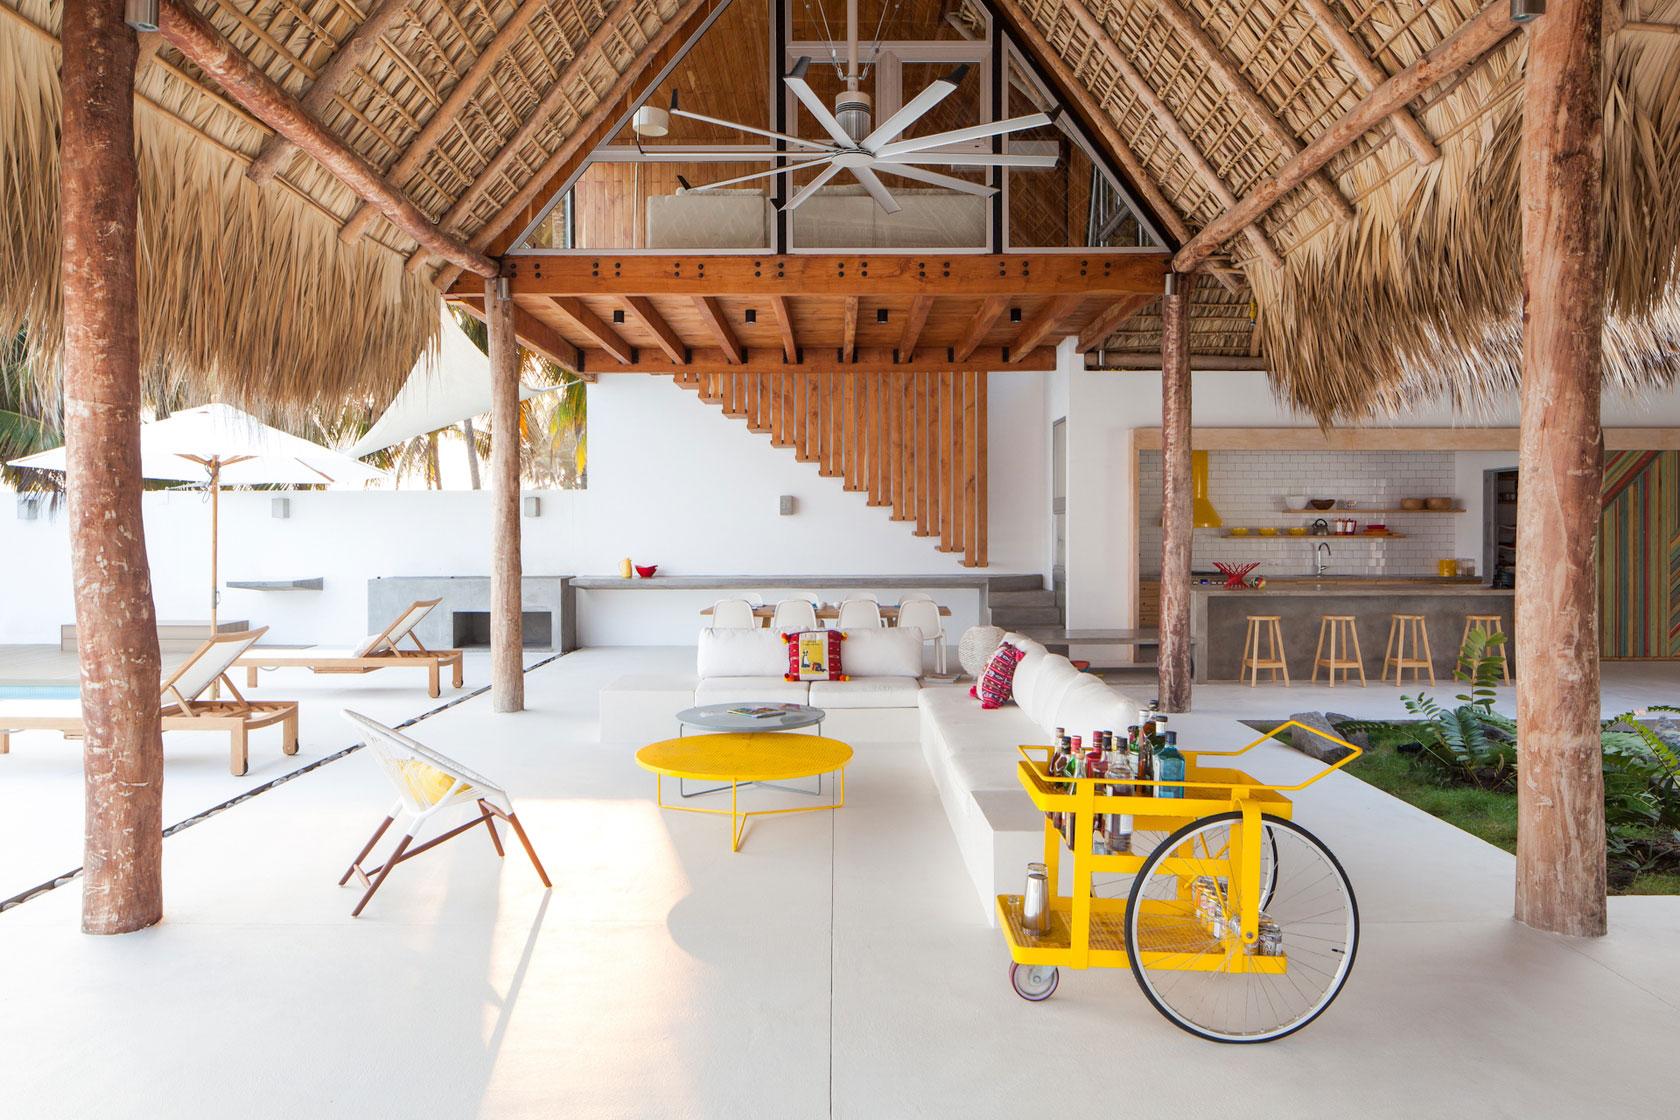 Living Space, Kitchen, Beach House in San Salvador, El Salvador